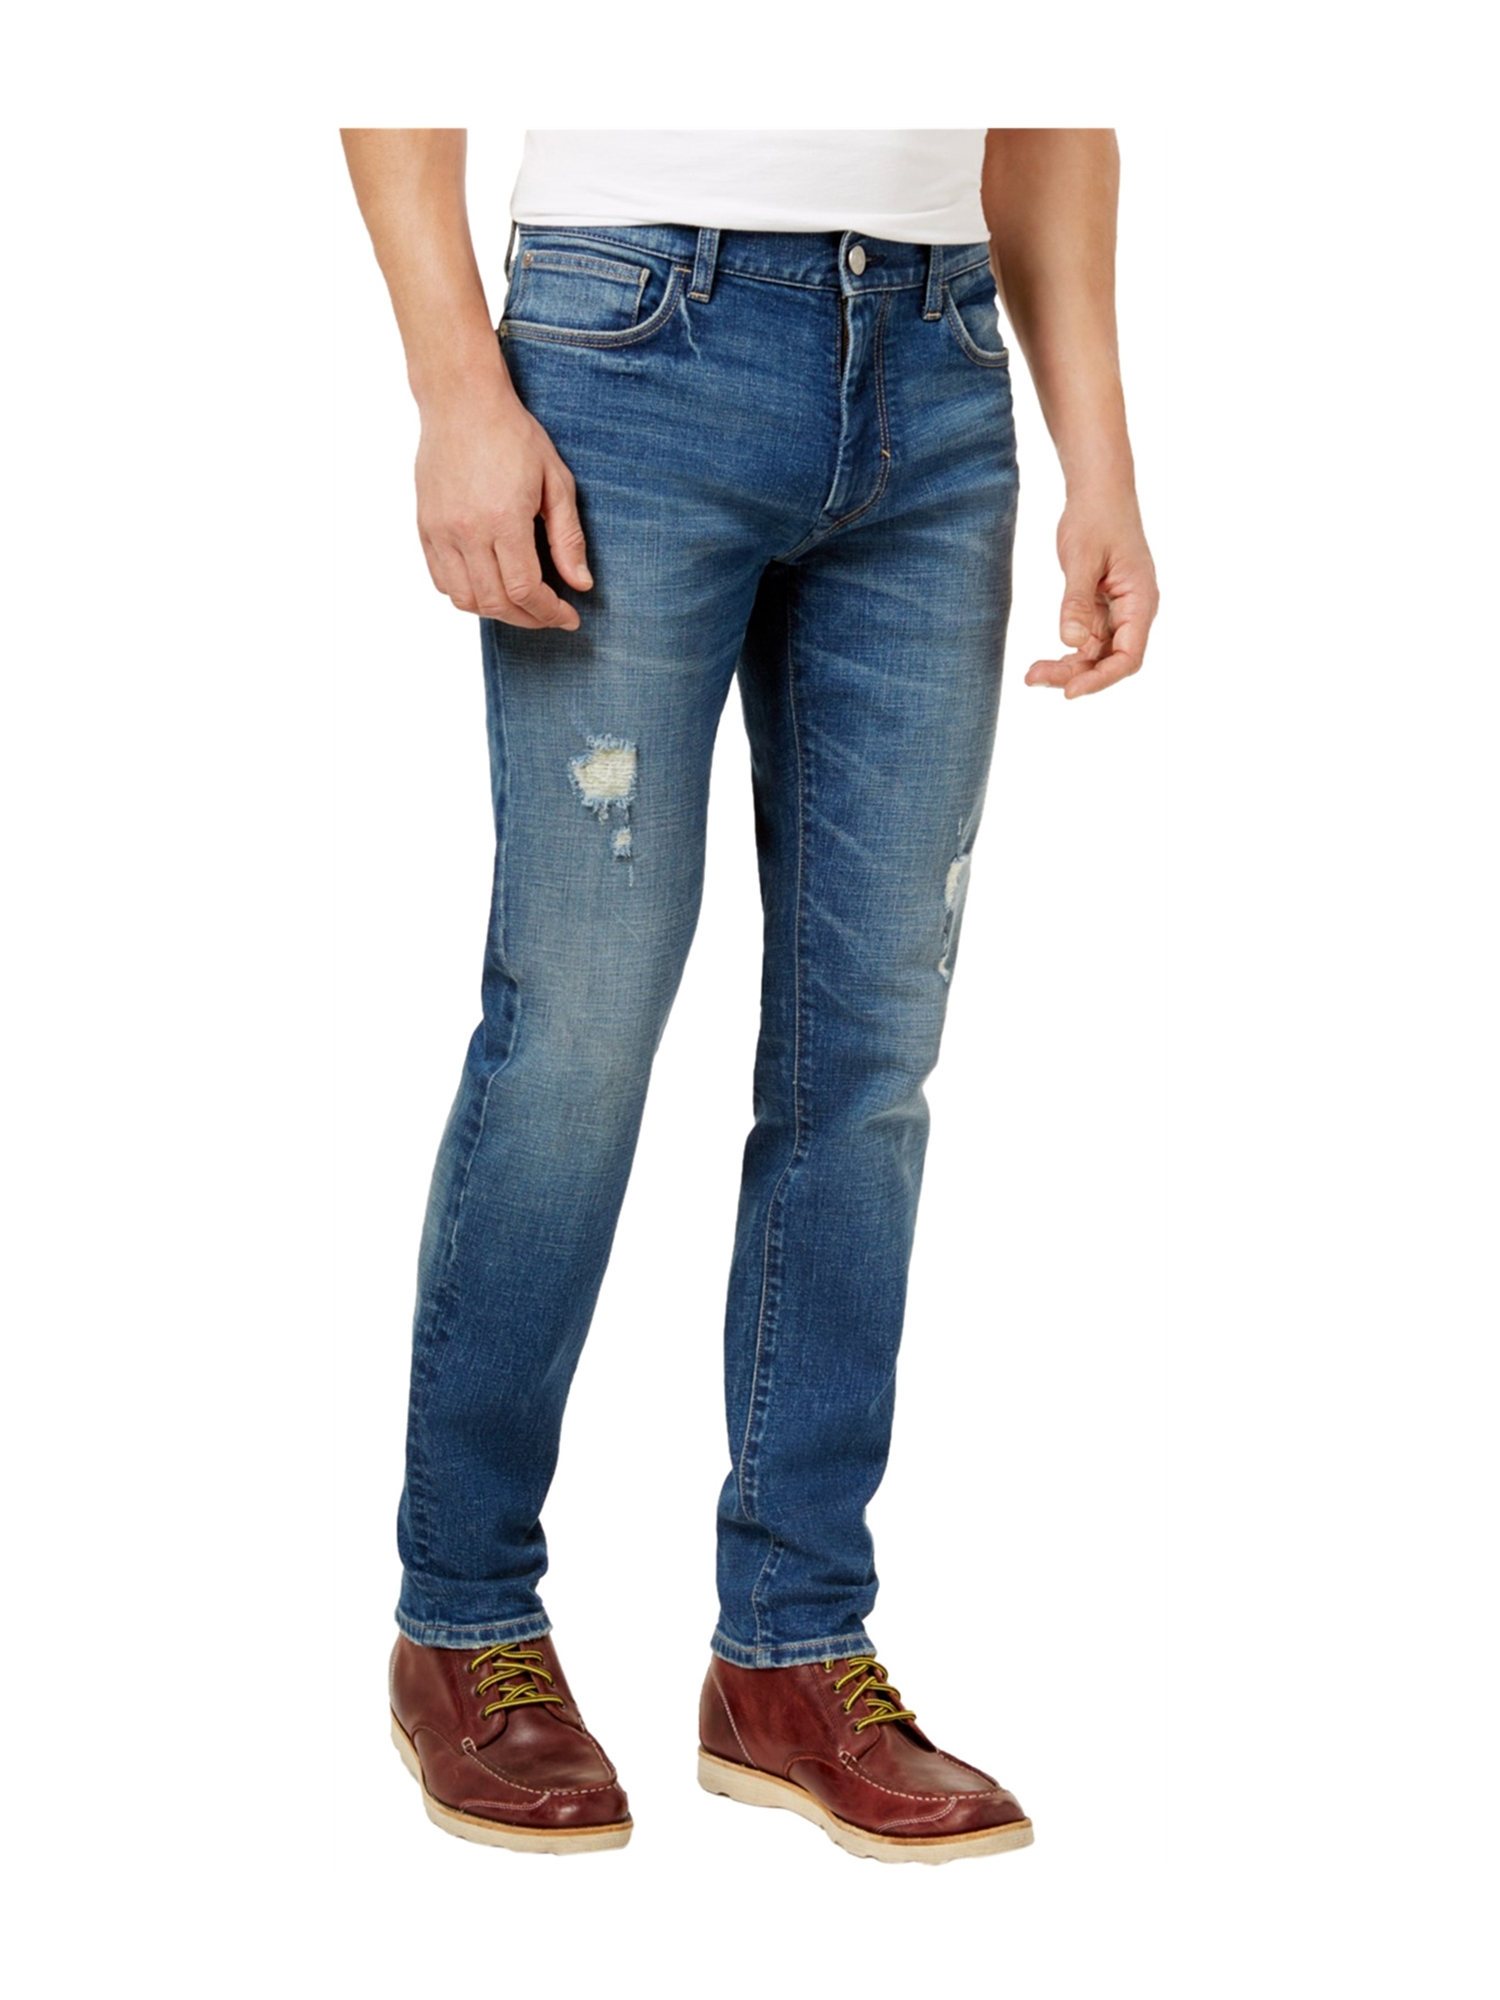 cac5f182ce68 Tommy Hilfiger Mens Distressed Slim Fit Jeans 479 33x32